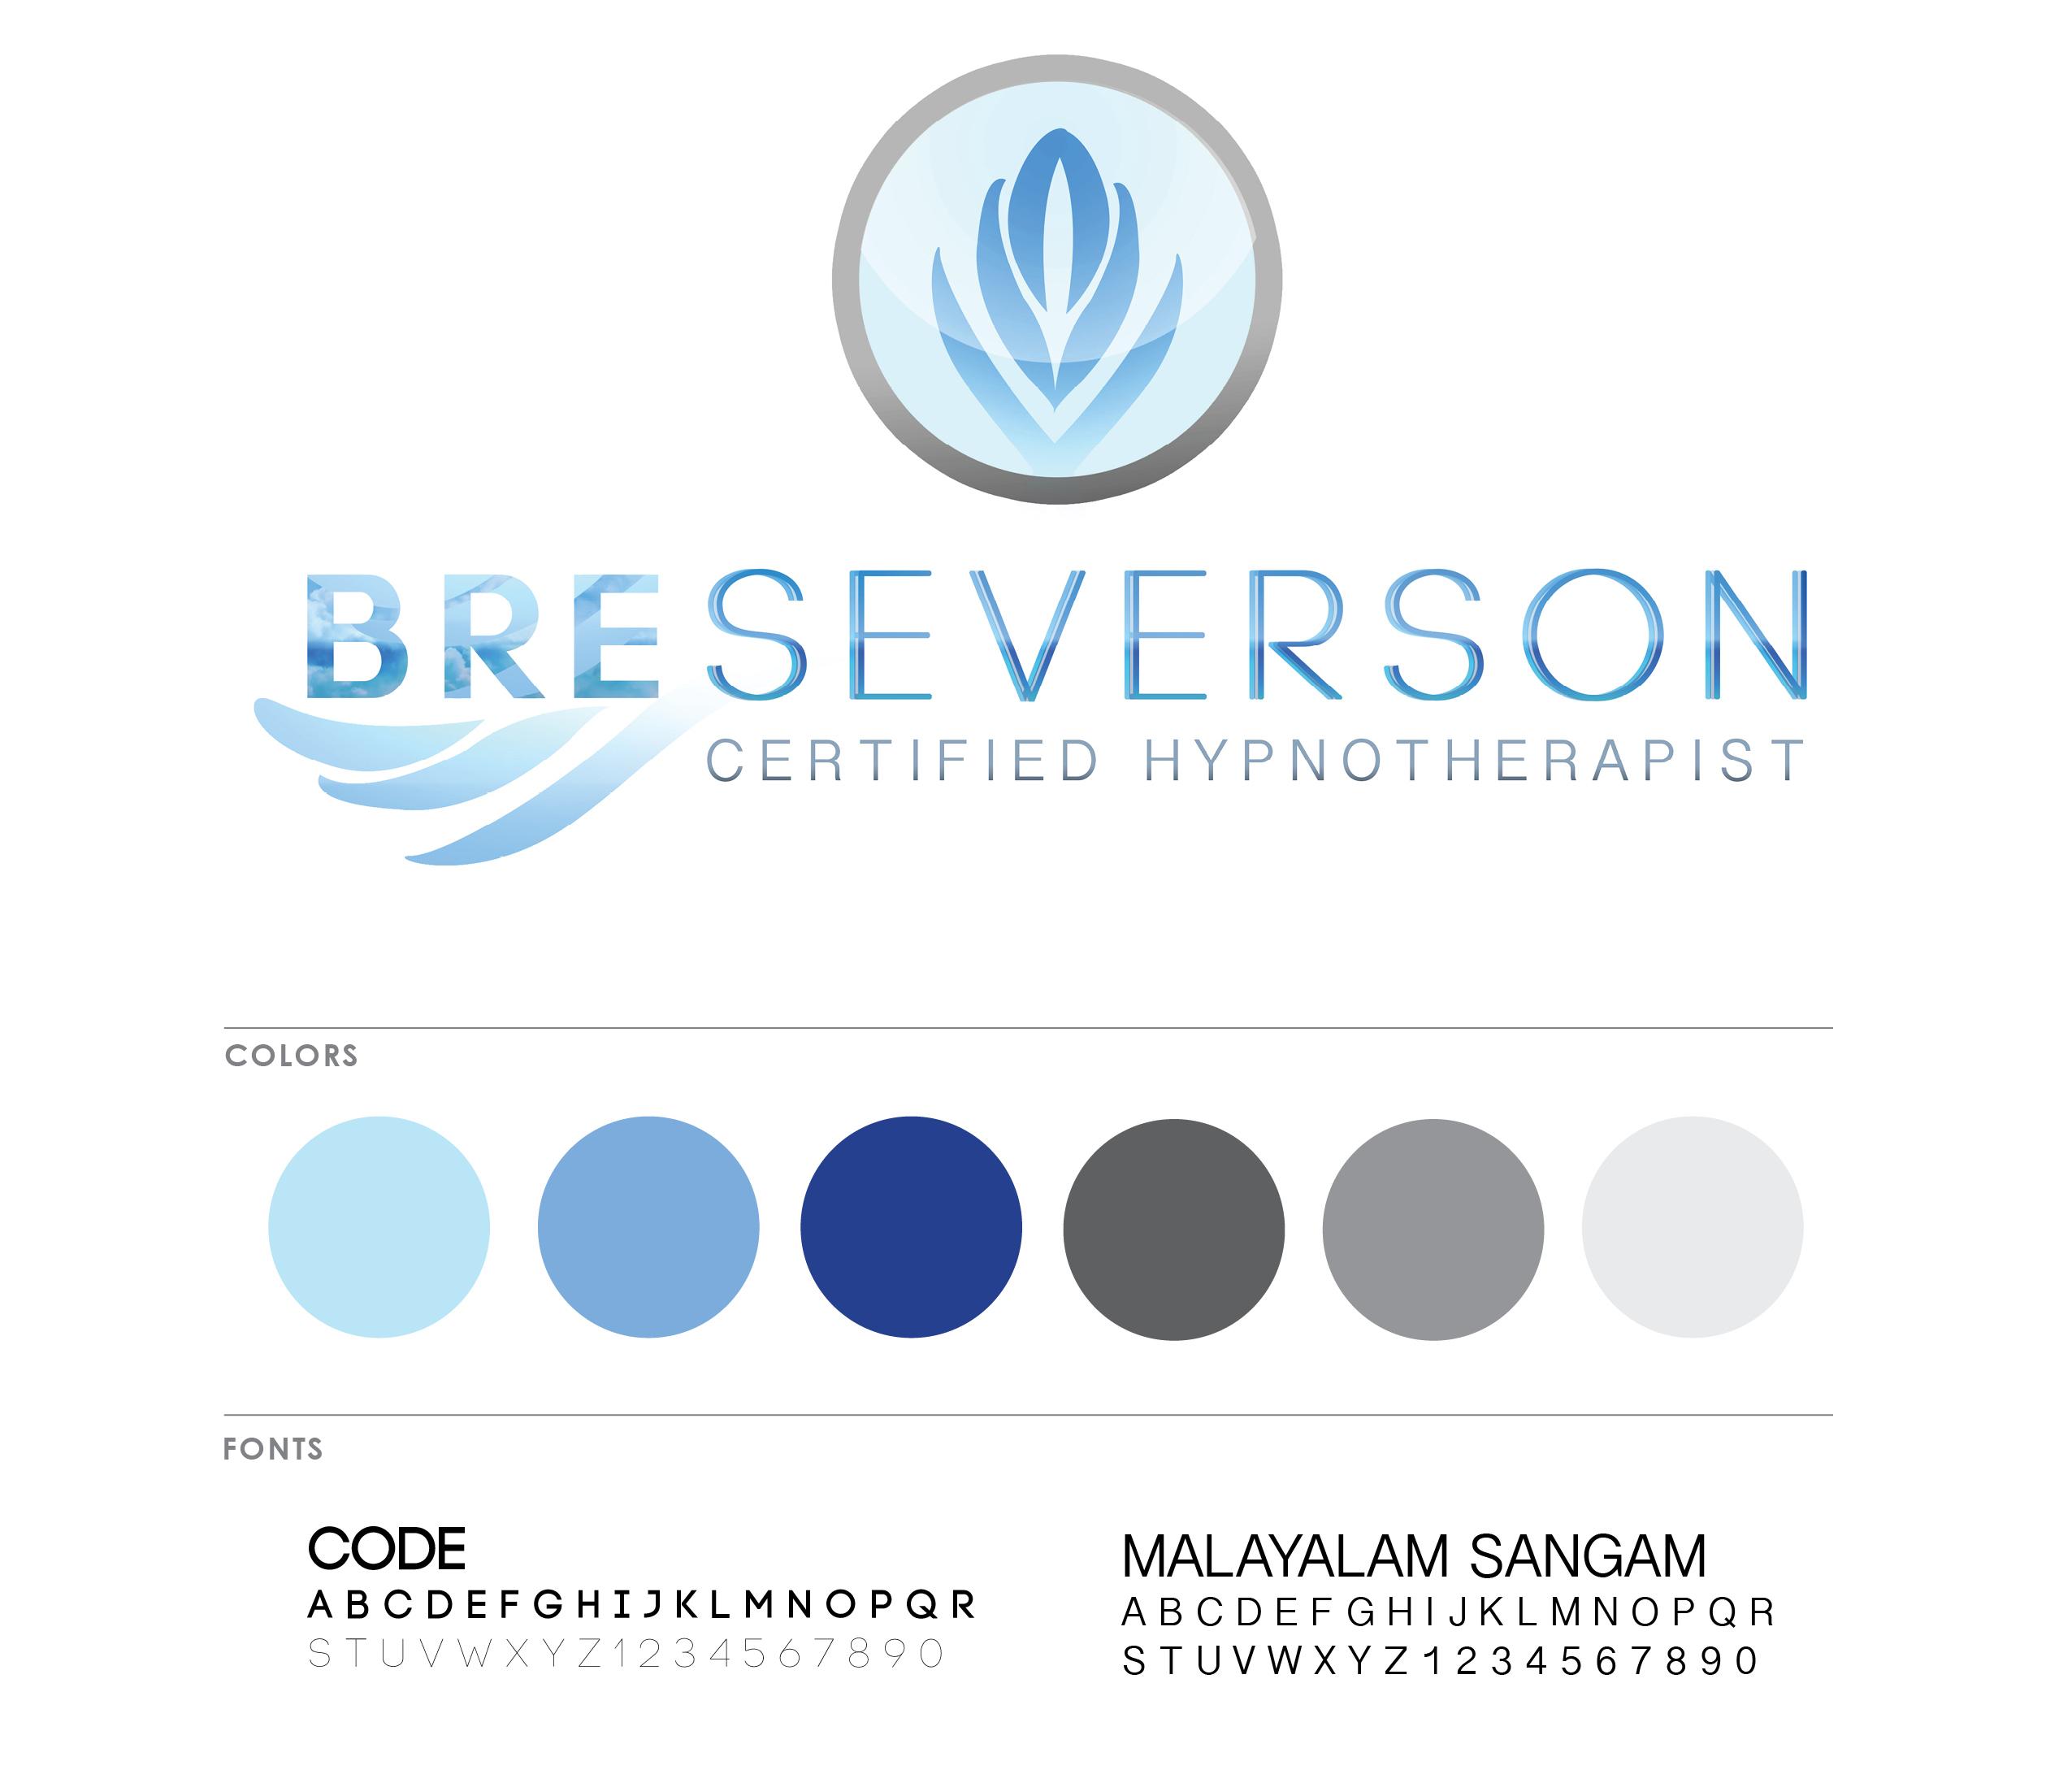 Bre Severson Hypnotherapy Branding Board